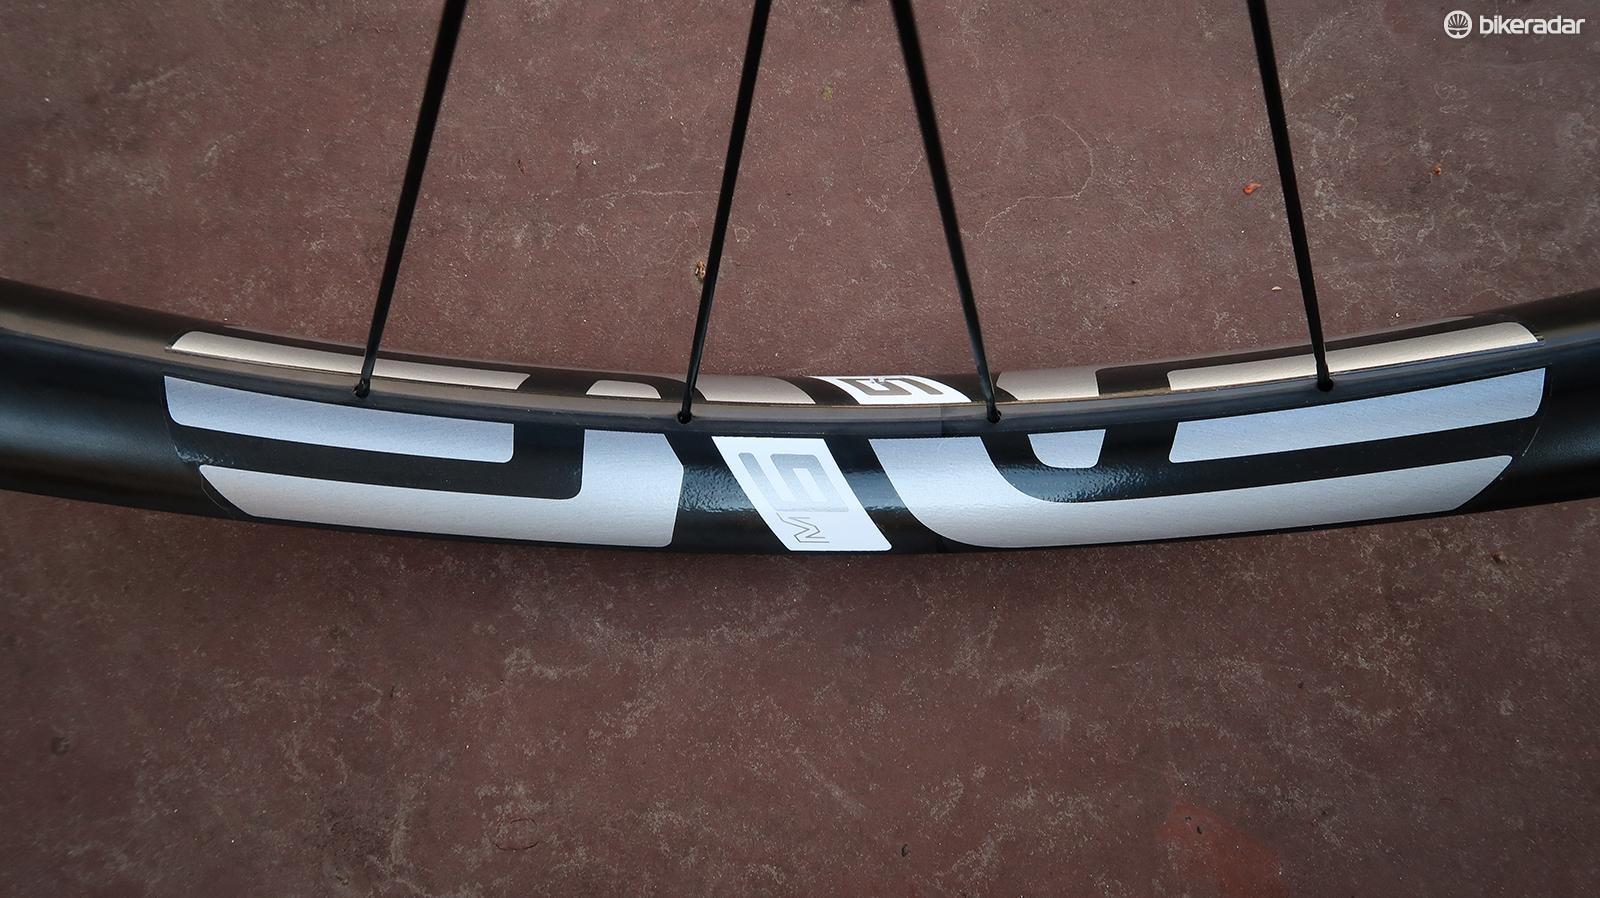 The Enve M635 rims have an internal width of 35mm